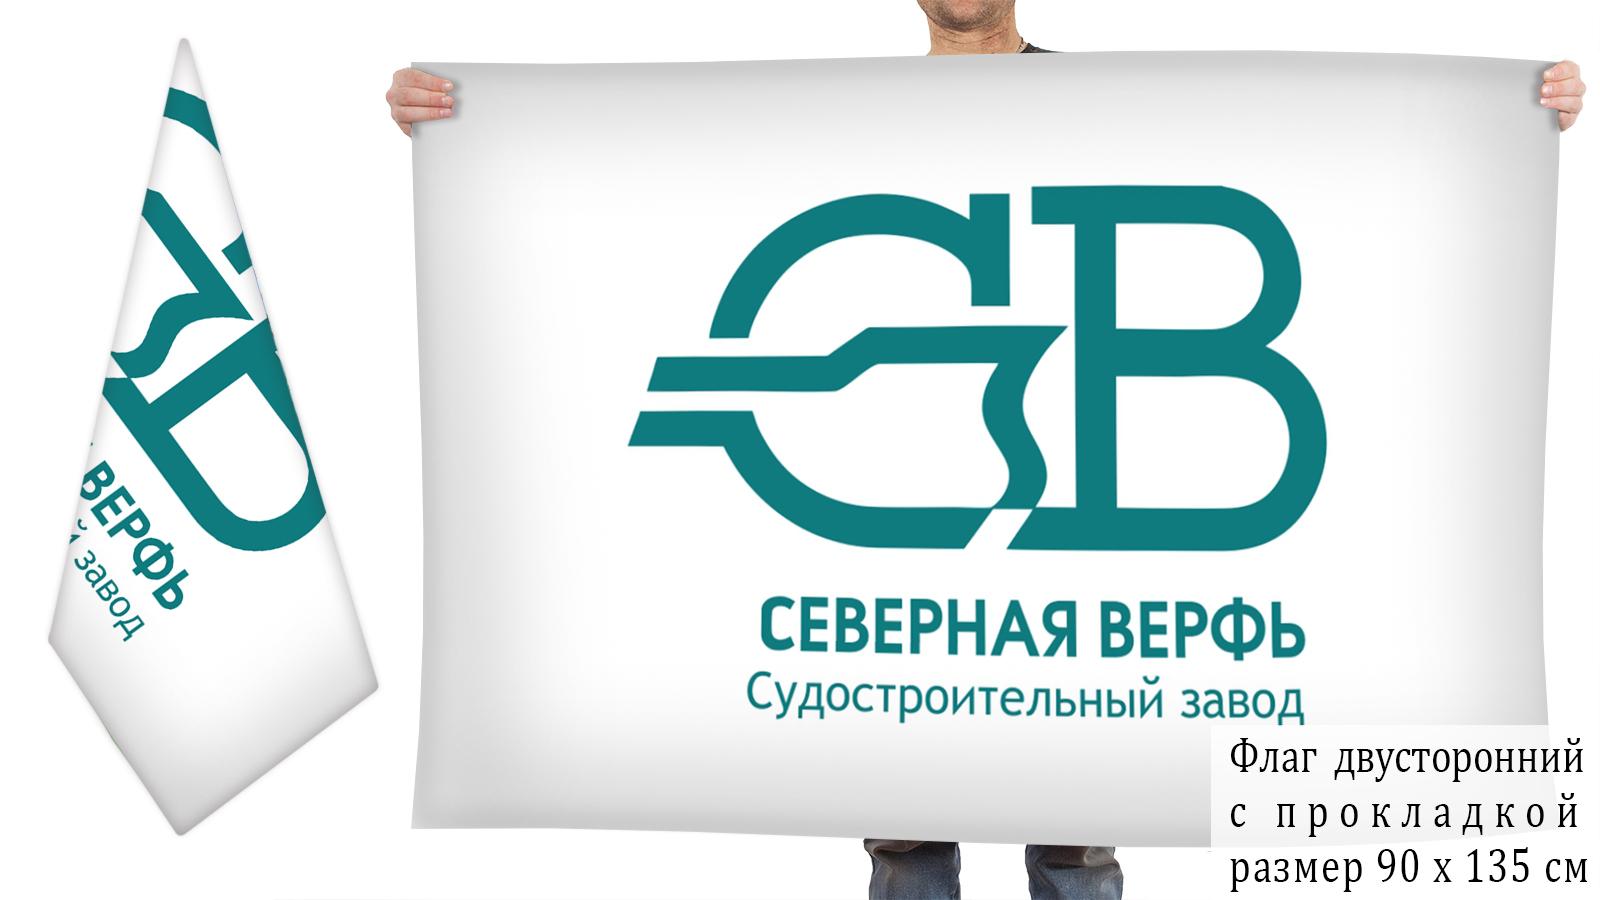 Двусторонний флаг Северной верфи